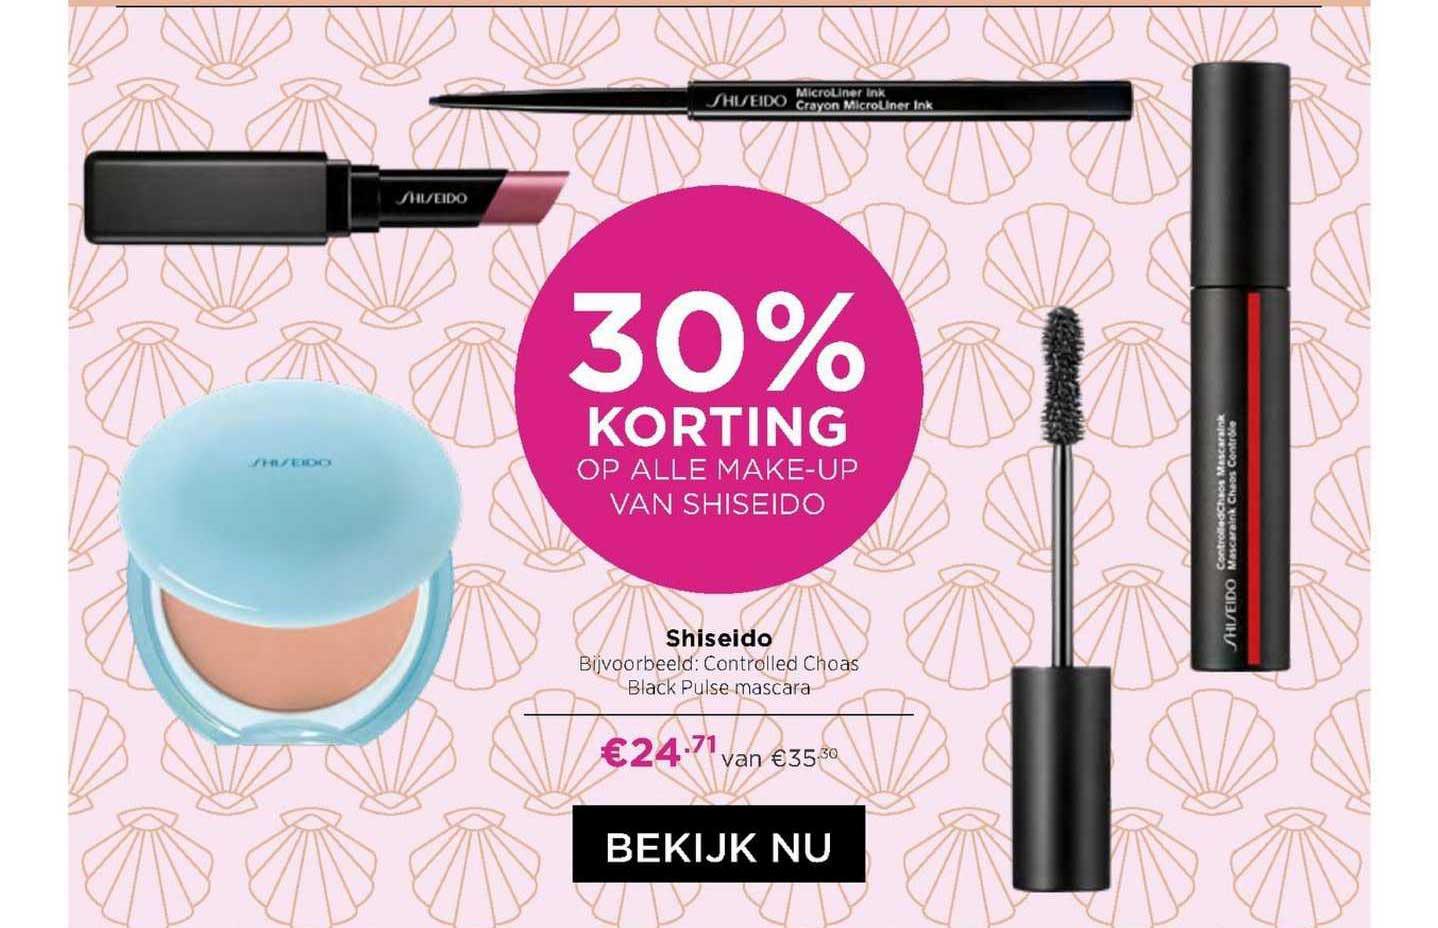 ICI PARIS XL Shiseido Controlled Choas Black Pulse Mascara 30% Korting